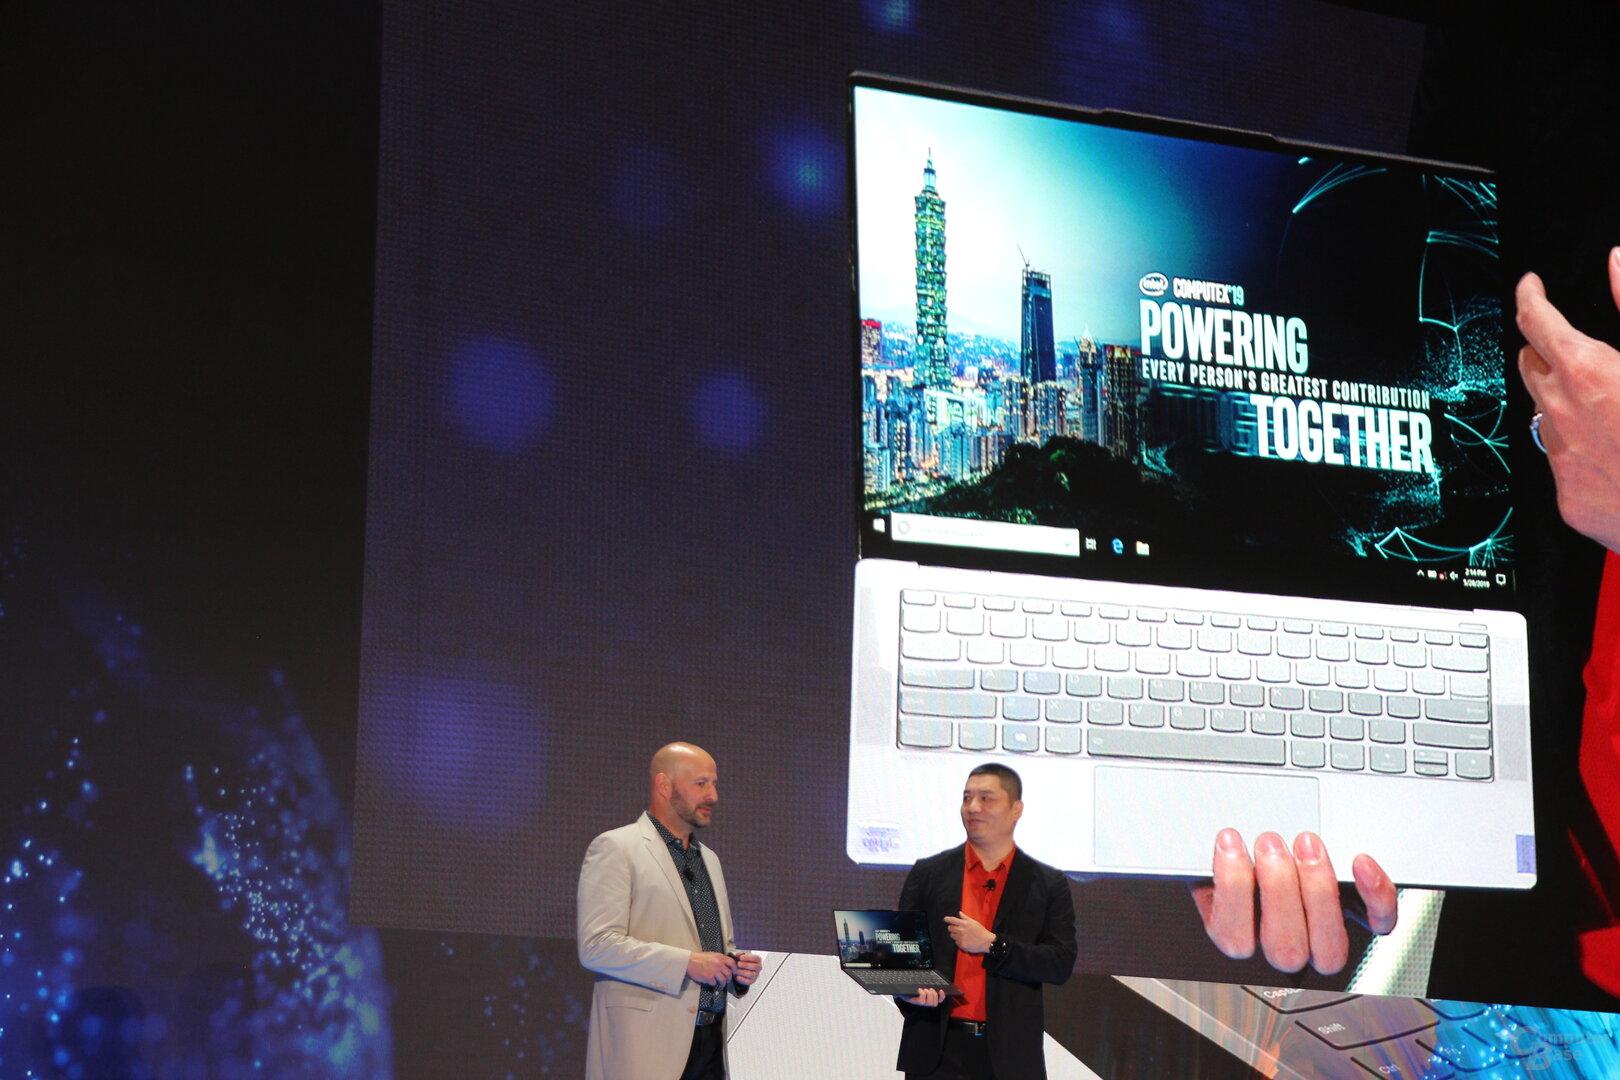 Lenovo Yoga S940 gehört zum Project Athena